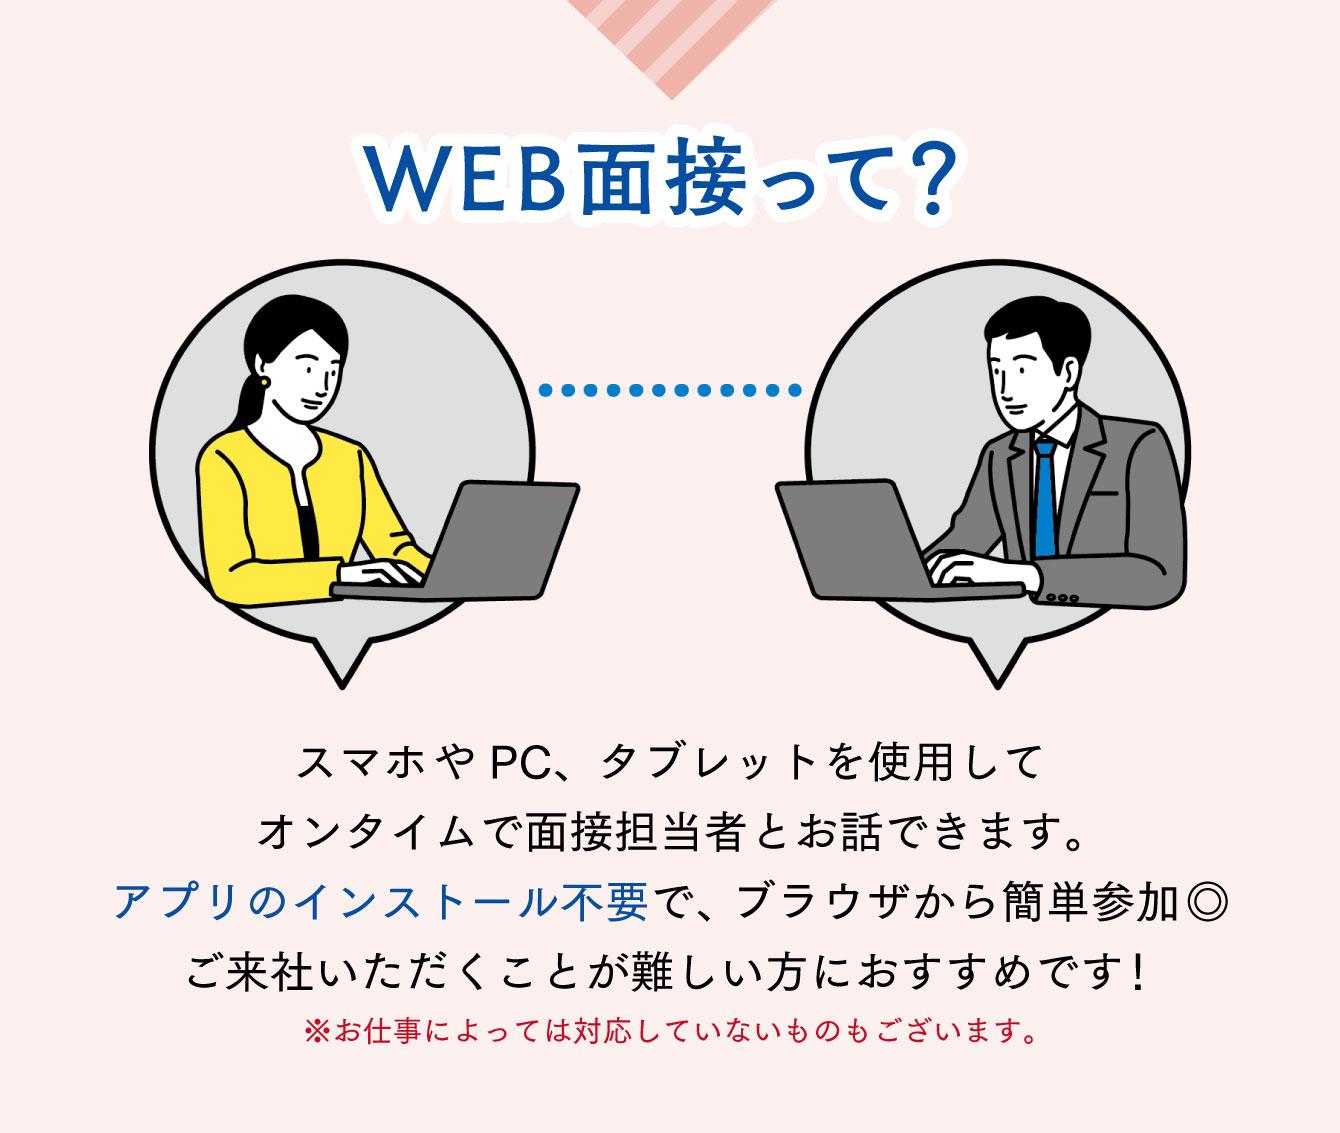 WEB面接って?